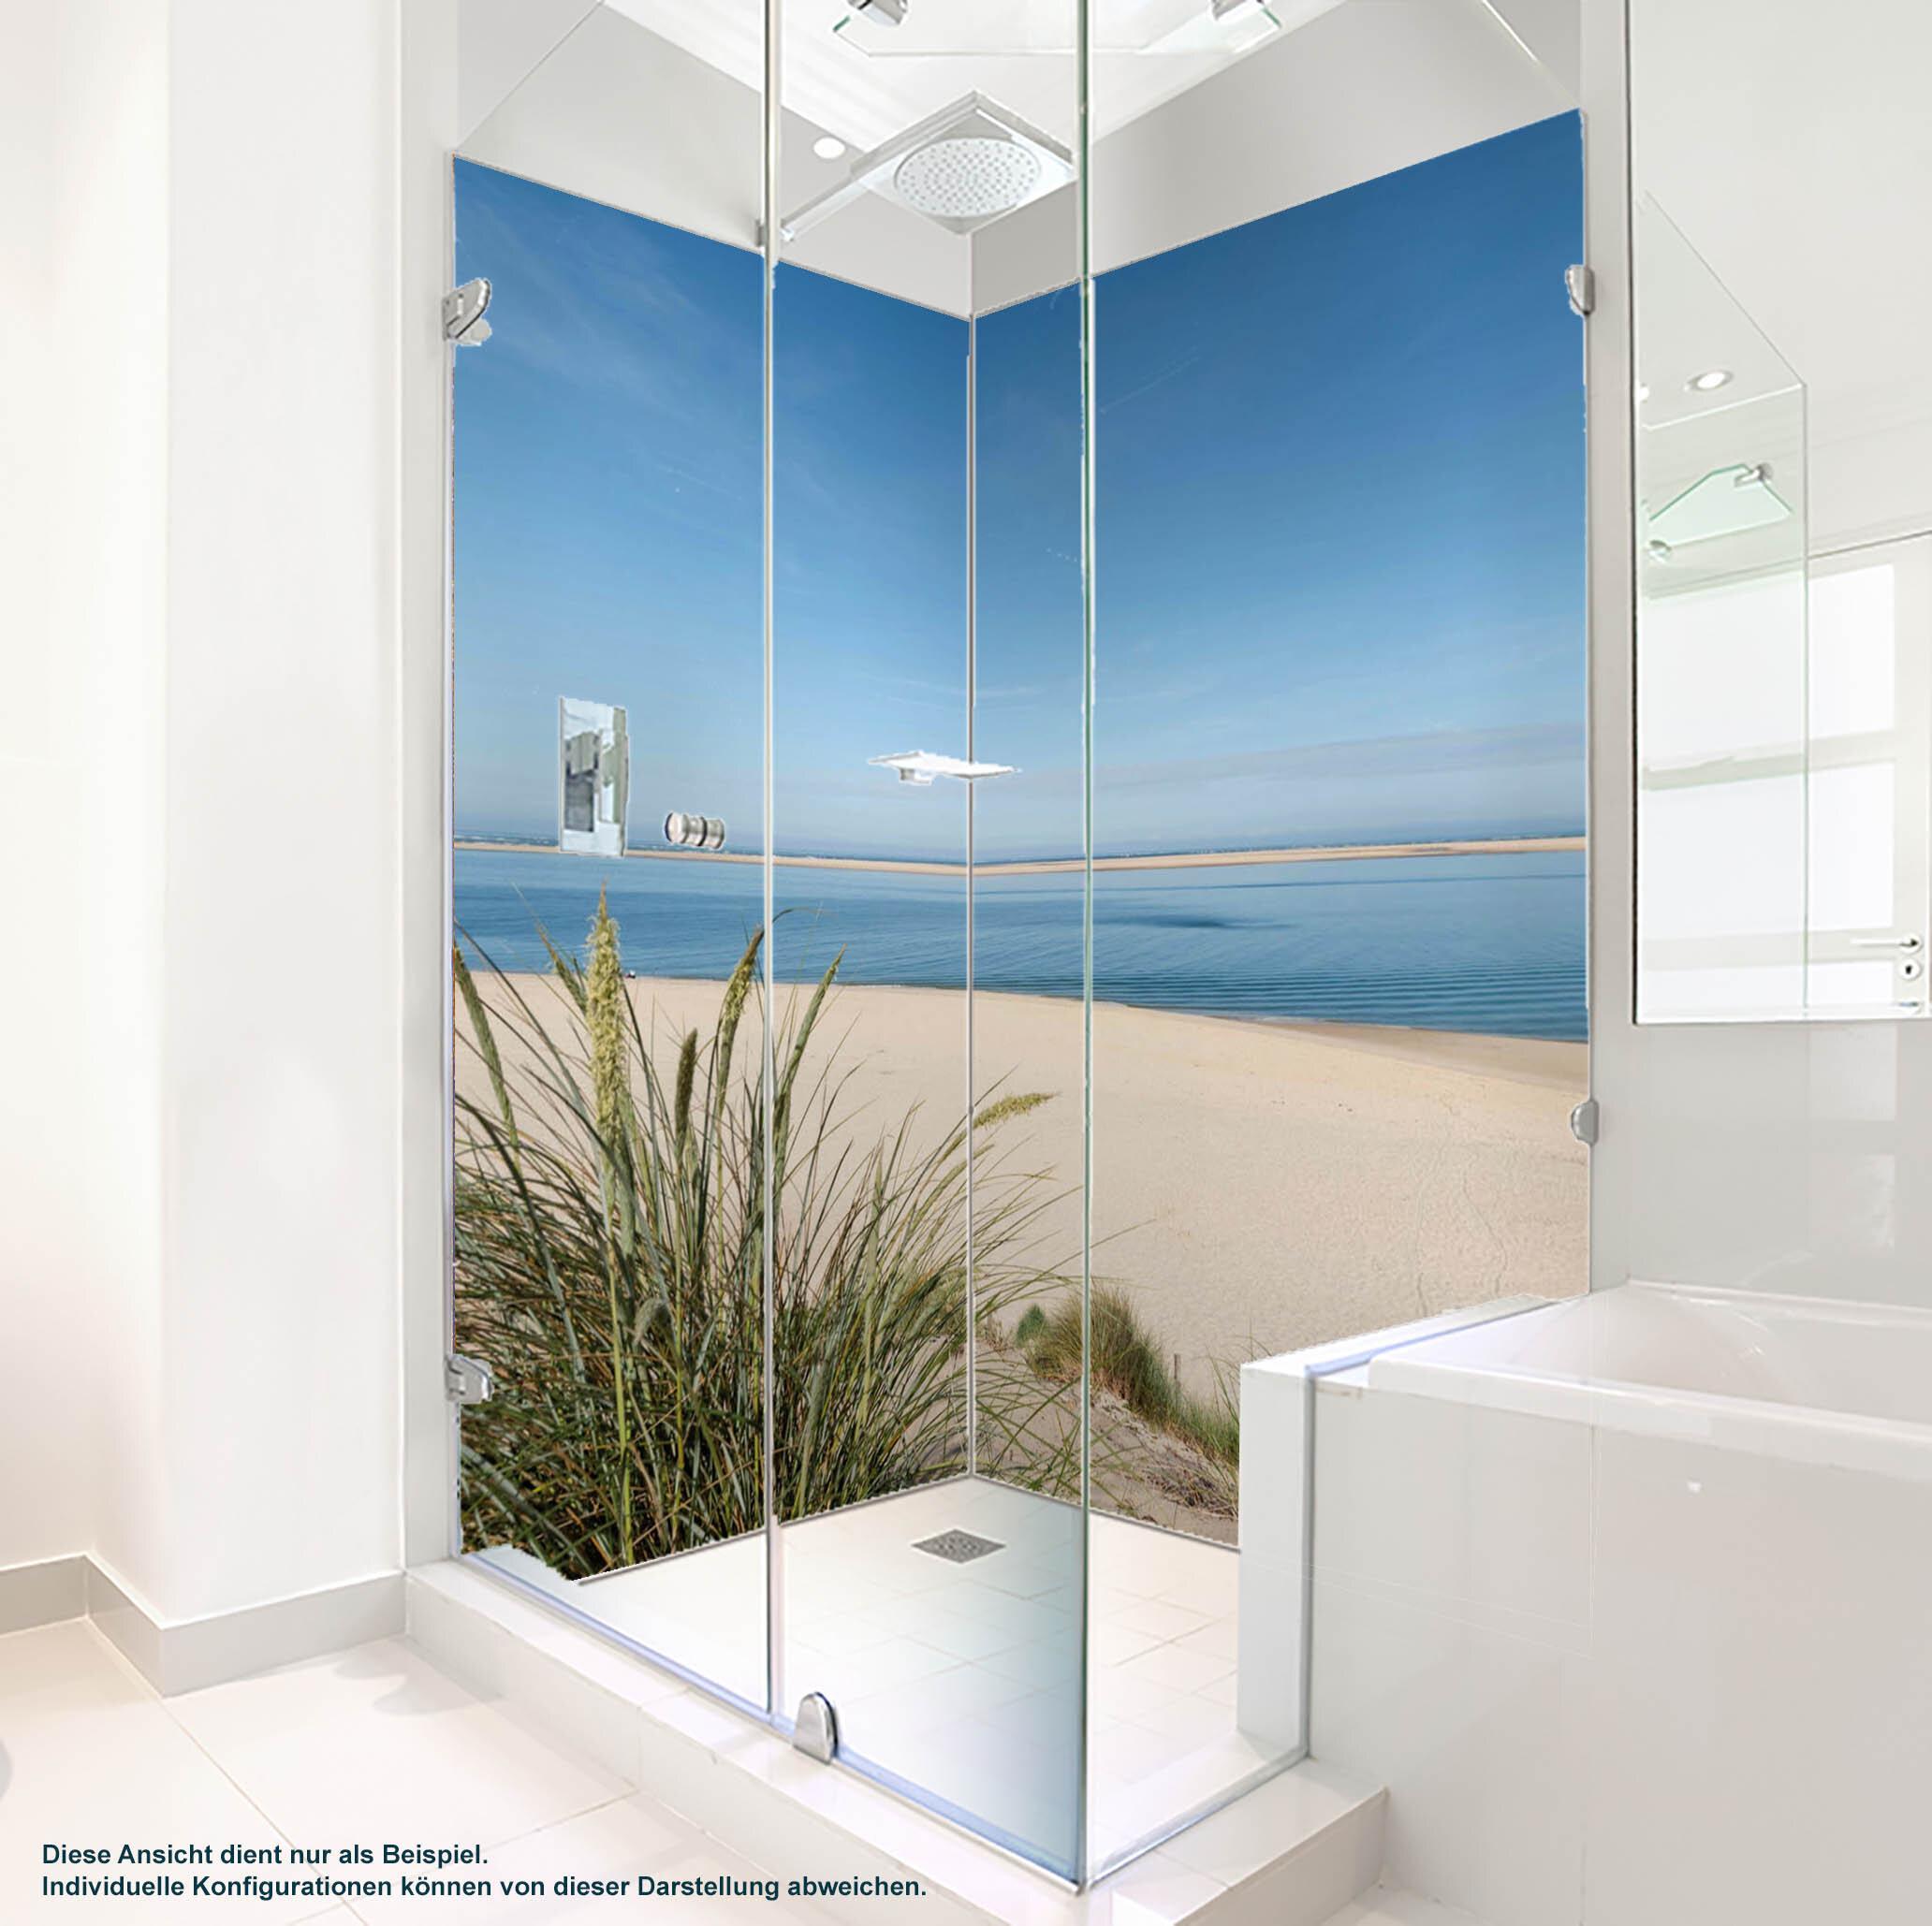 Dusche PlateART Duschrückwand mit Motiv Strand und Meer Ostsee Düne